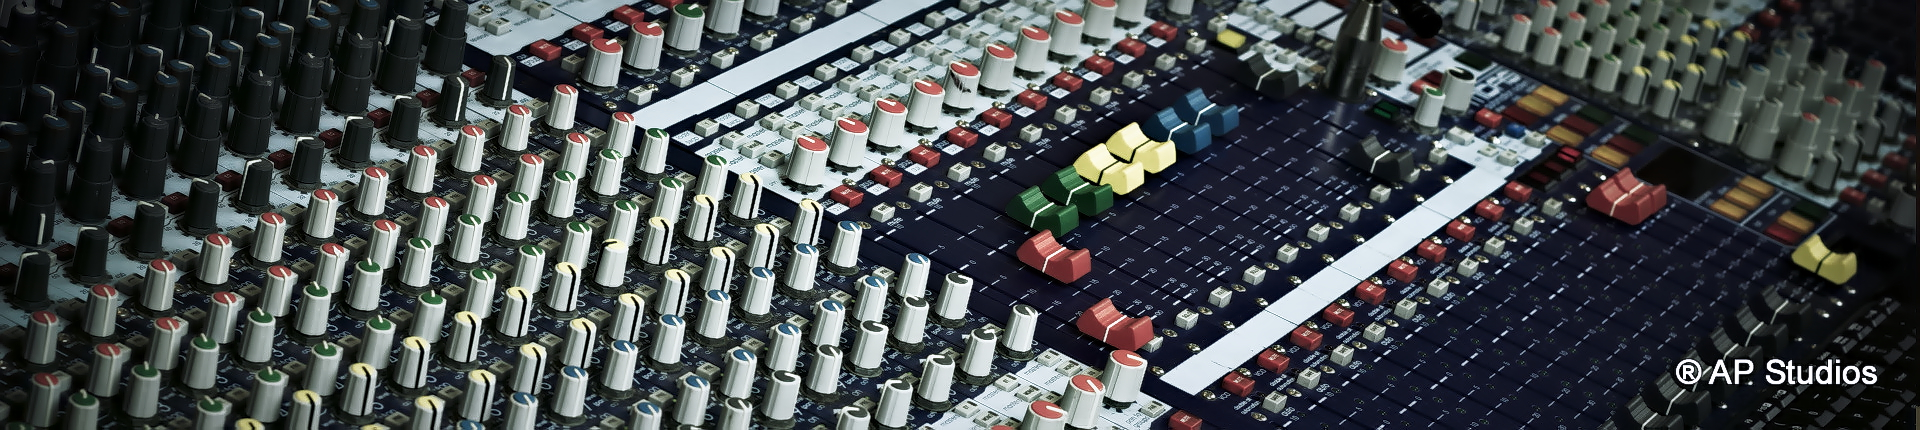 AP Recording Studios Dublin Midas Heritage 1000 Mixing Desk